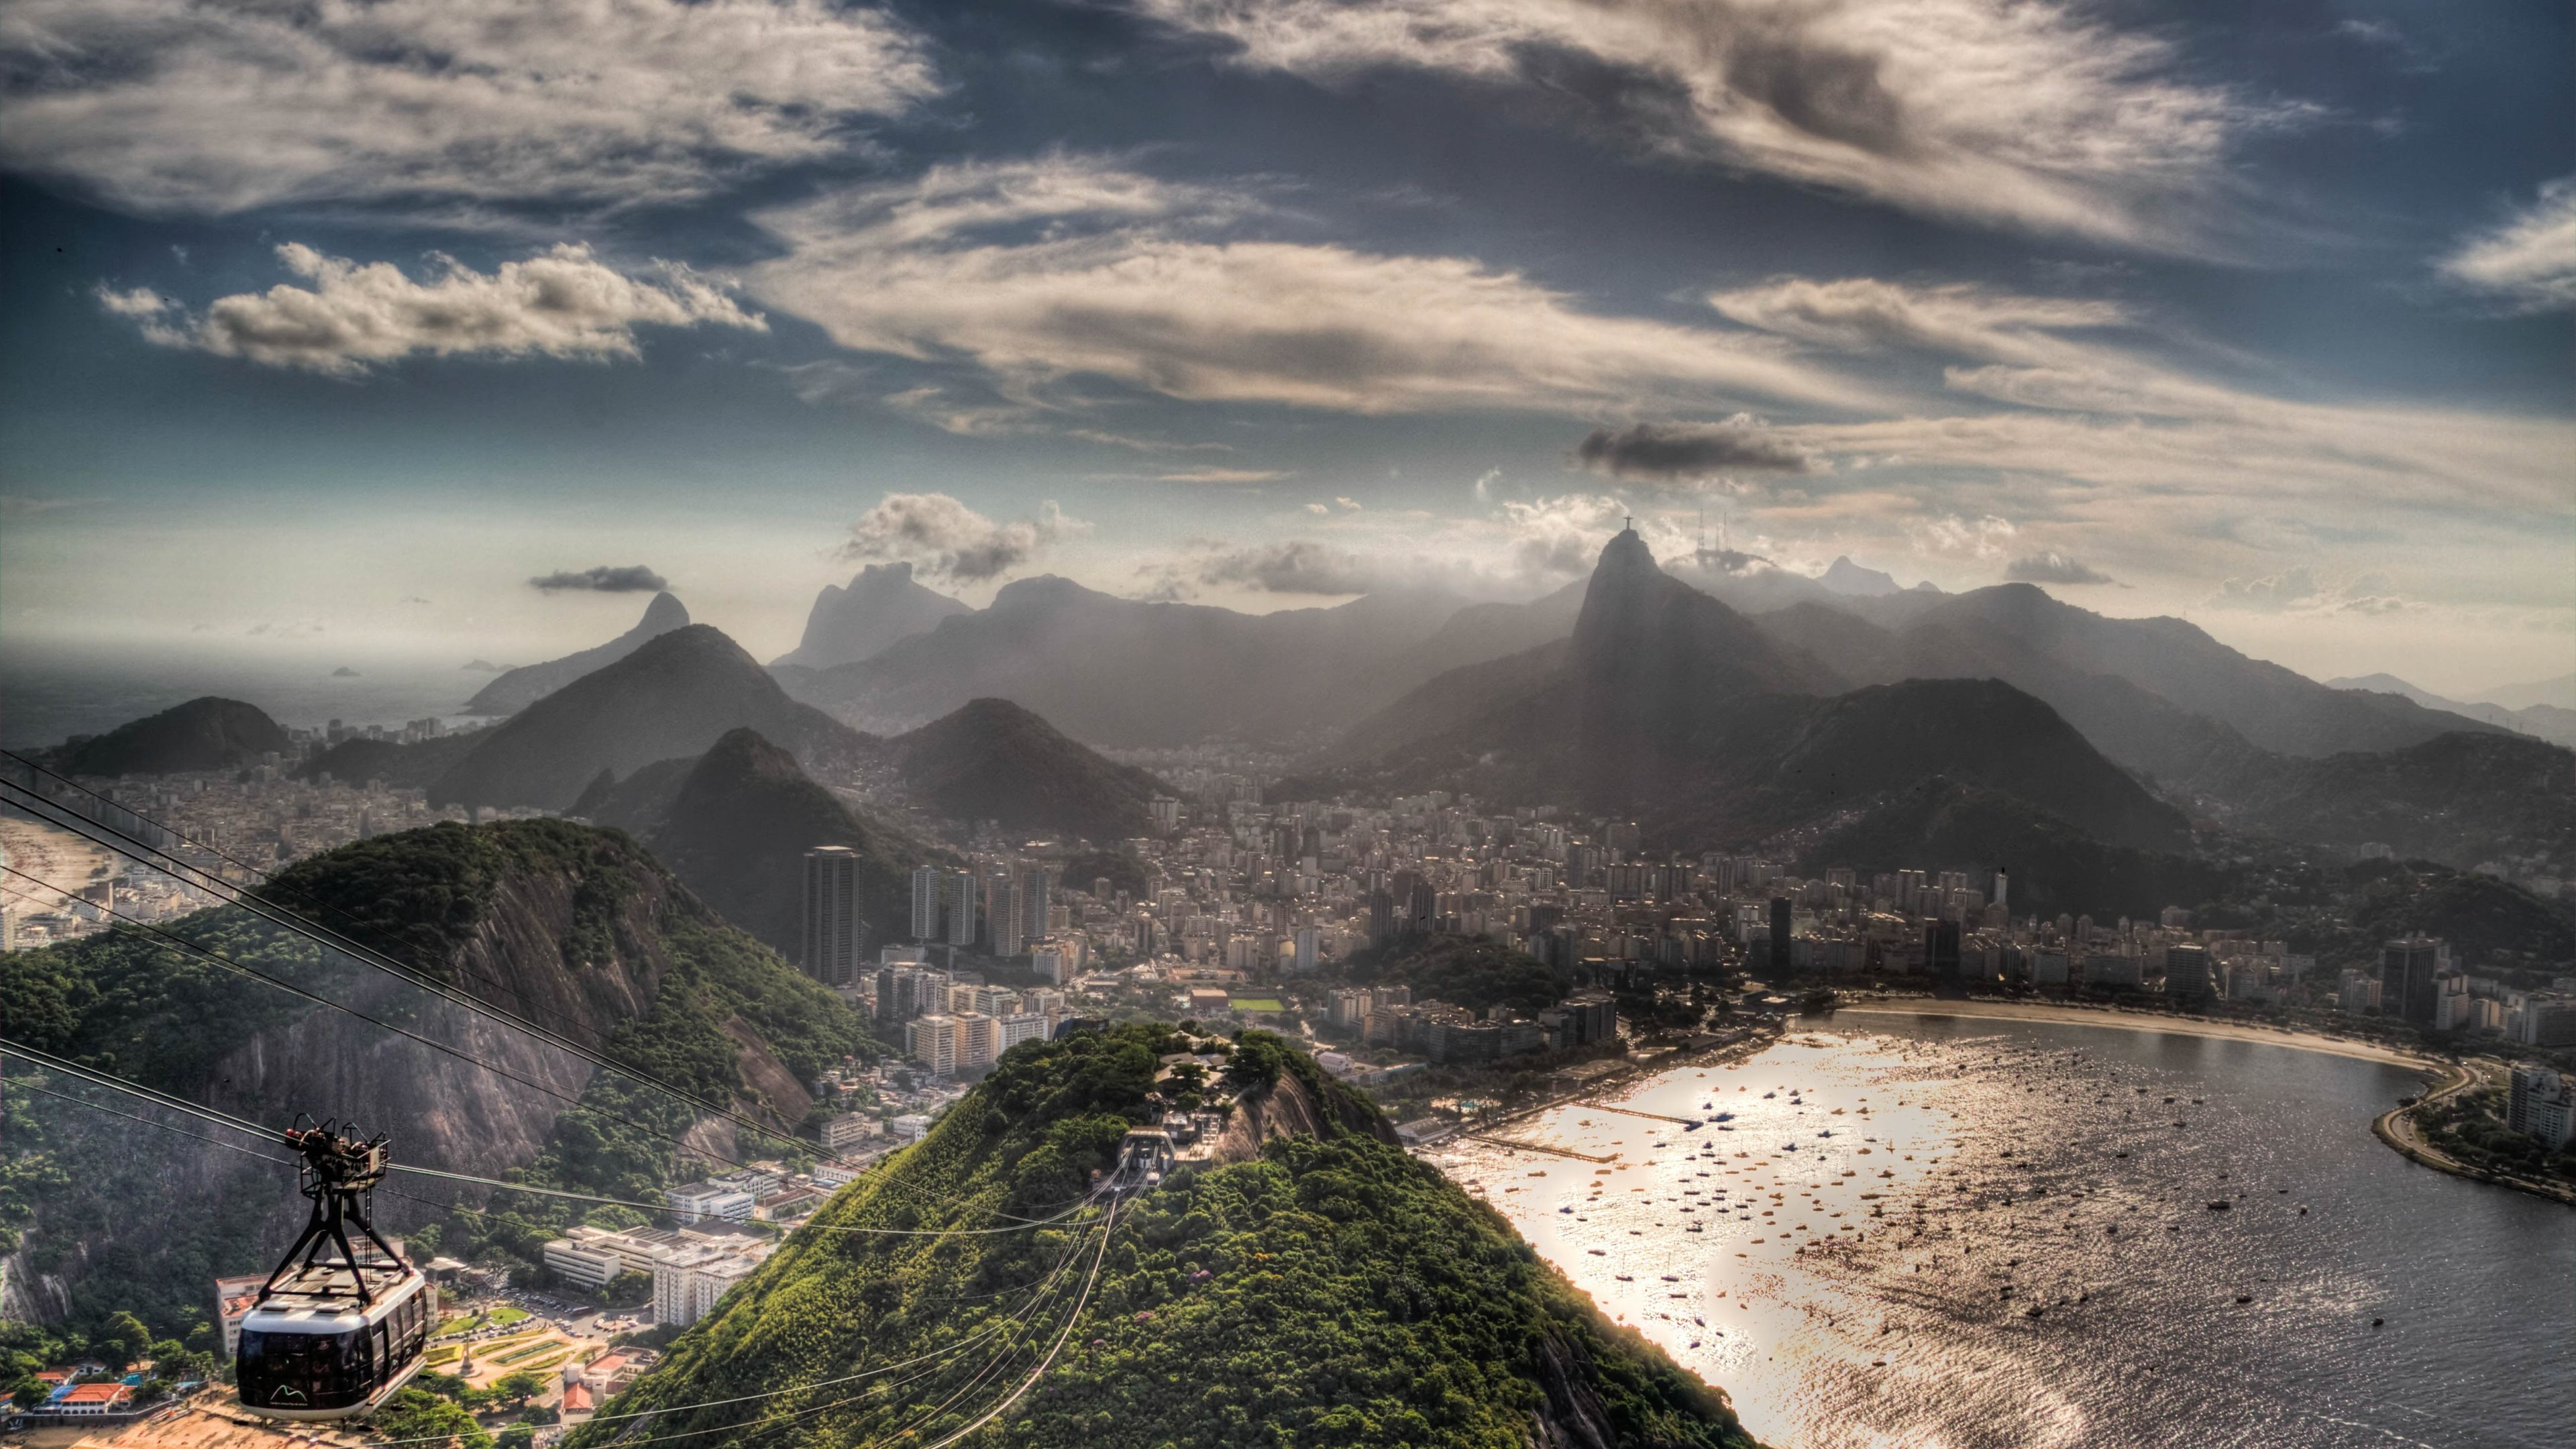 Rio De Janeiro 4k Ultra Papel De Parede Hd Plano De Fundo